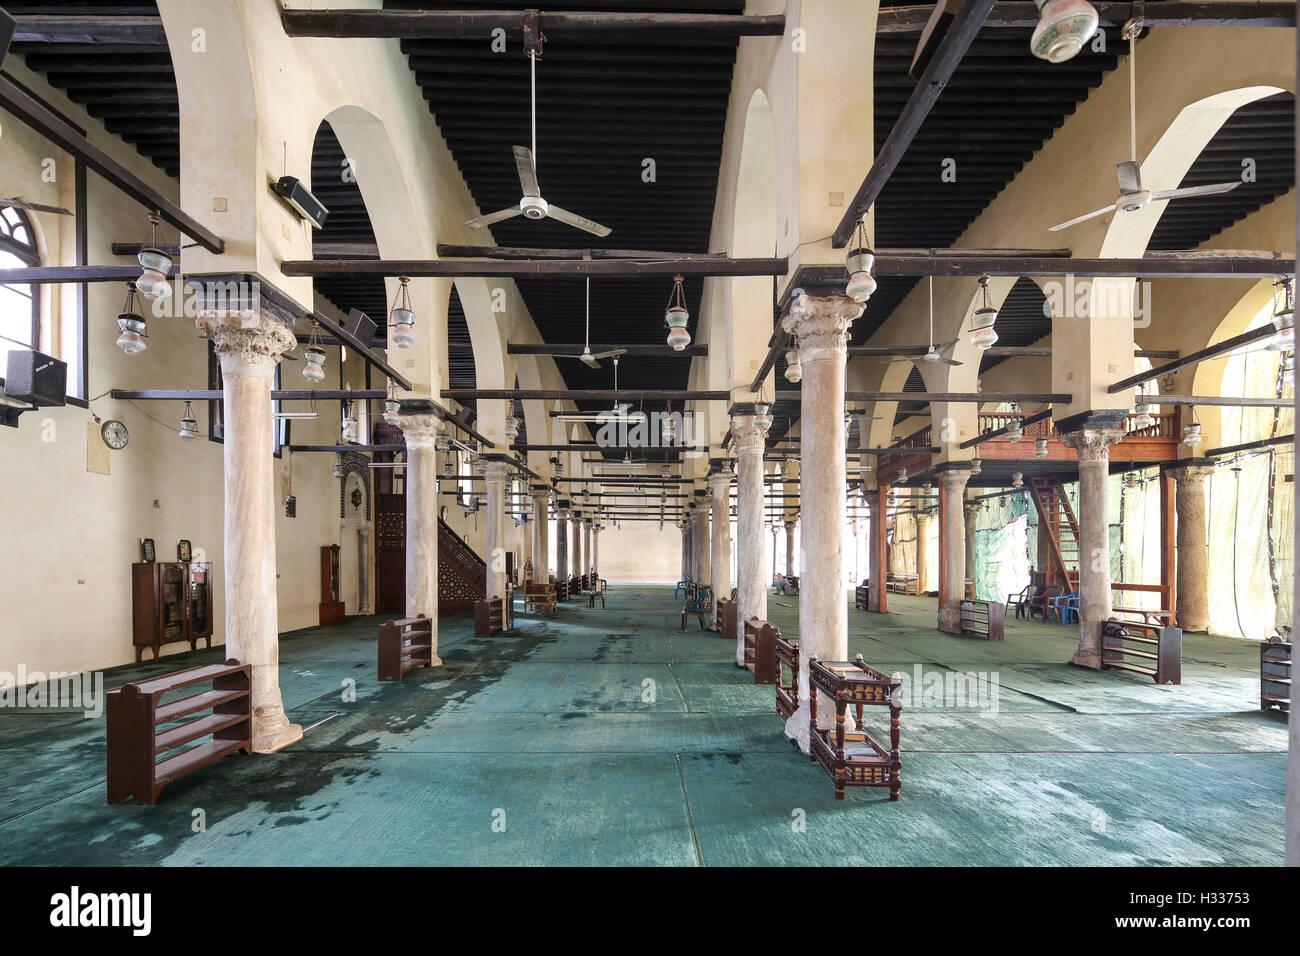 prayer hall,  mosque at Mahallat al-Kubra, Egypt - Stock Image